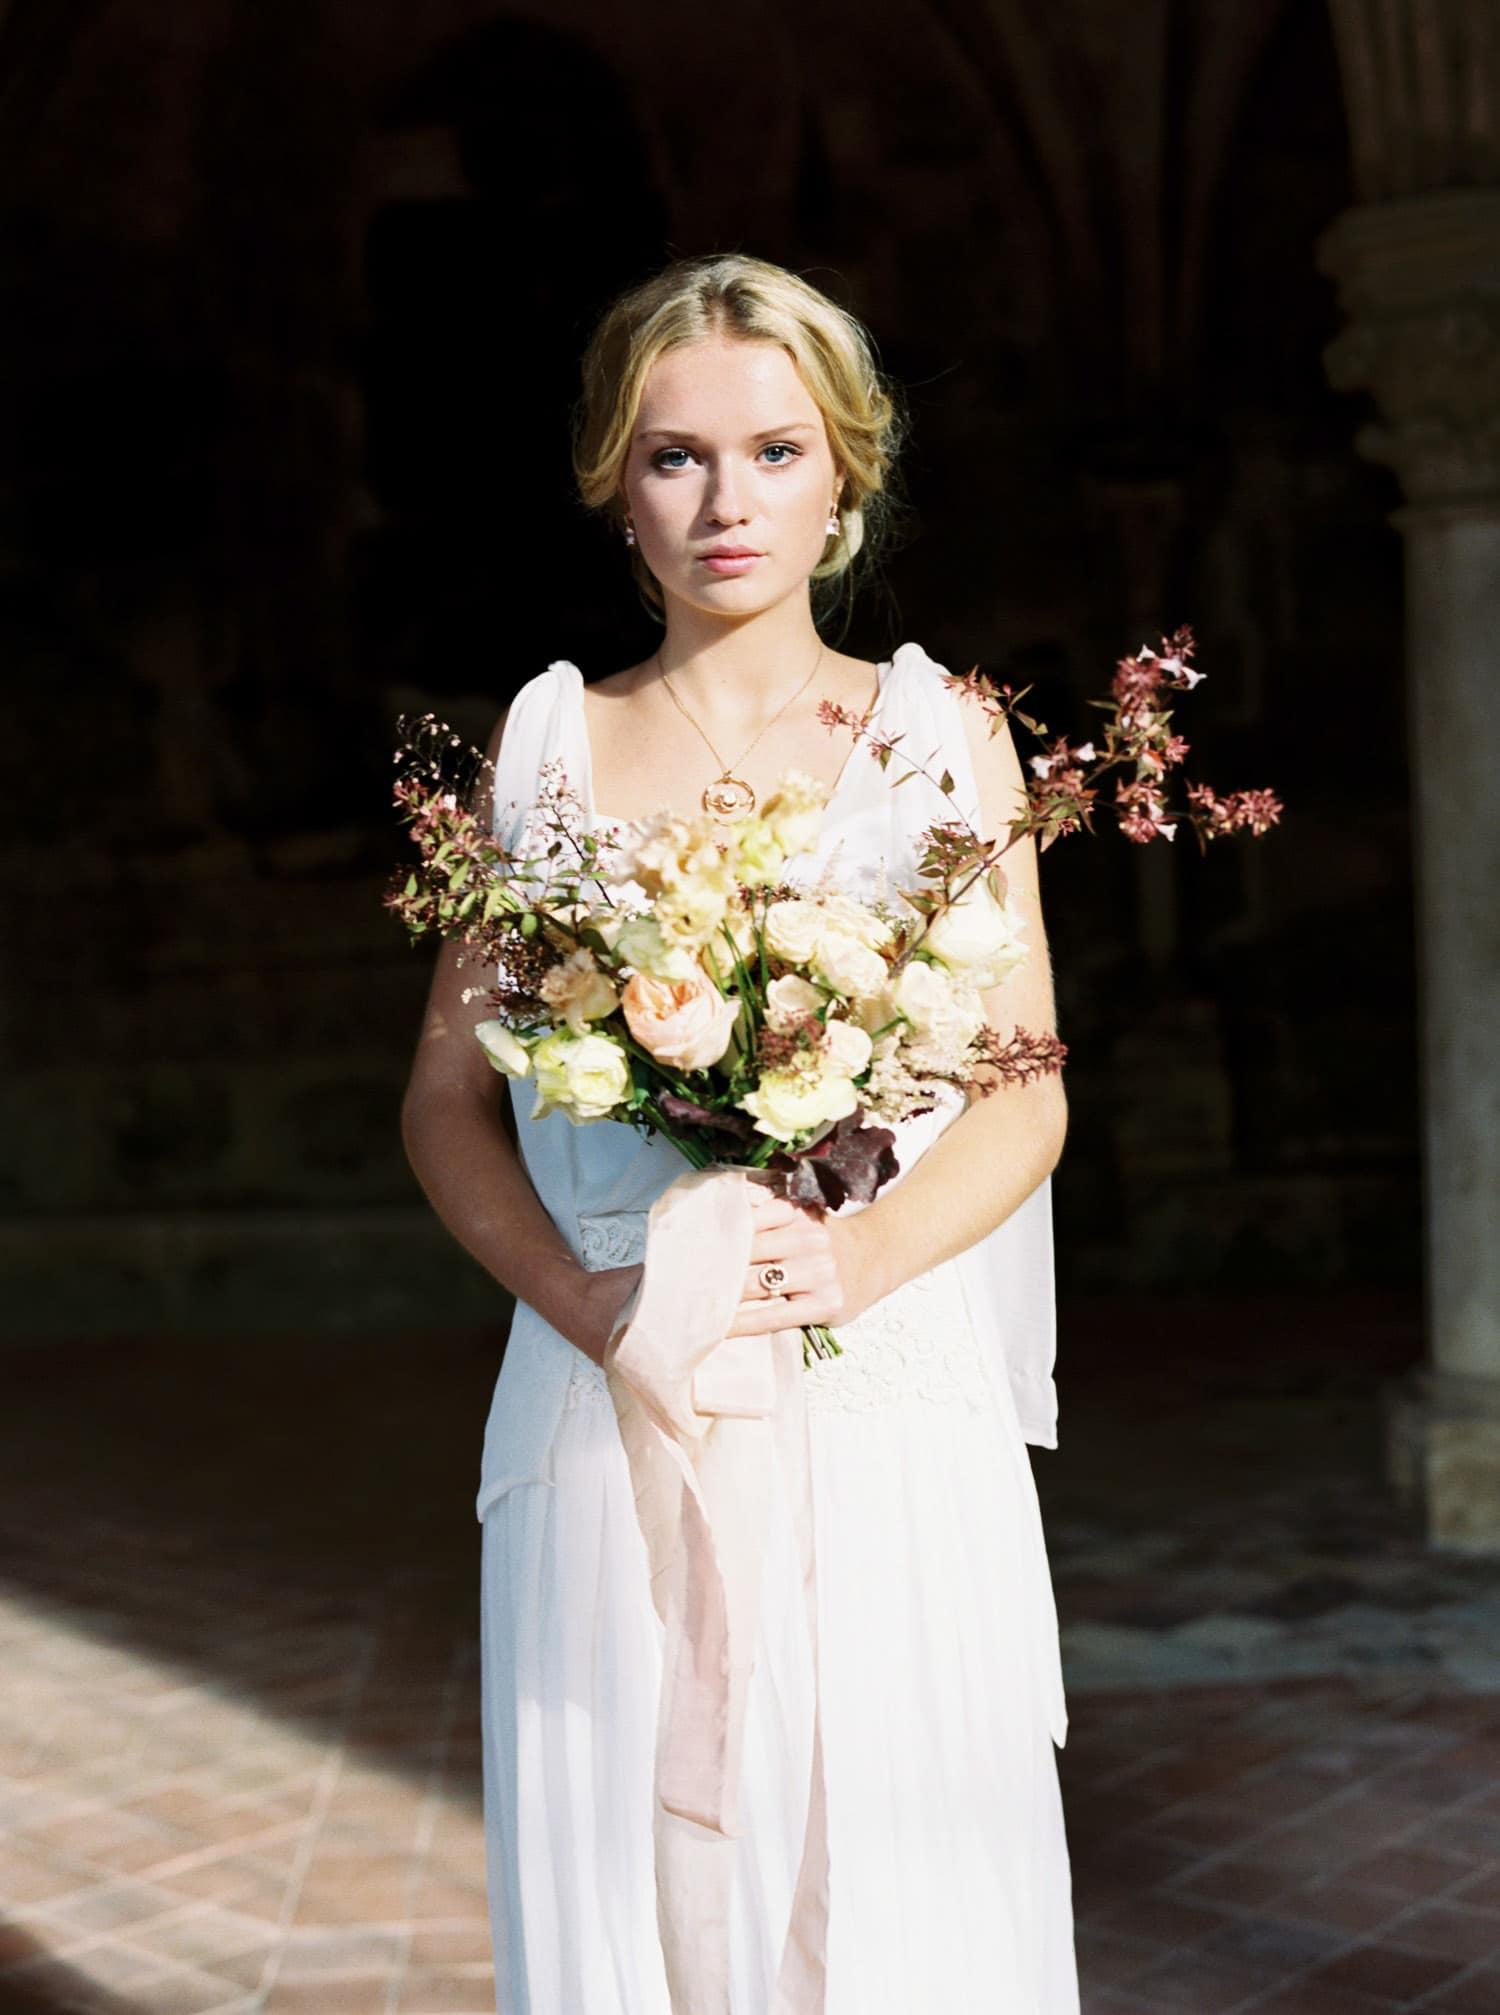 bride, bridal bouquet, autumn wedding, autumn bridal bouquet, silk ribbon, mystical bridal shoot, Veronique Lorre, wedding styling